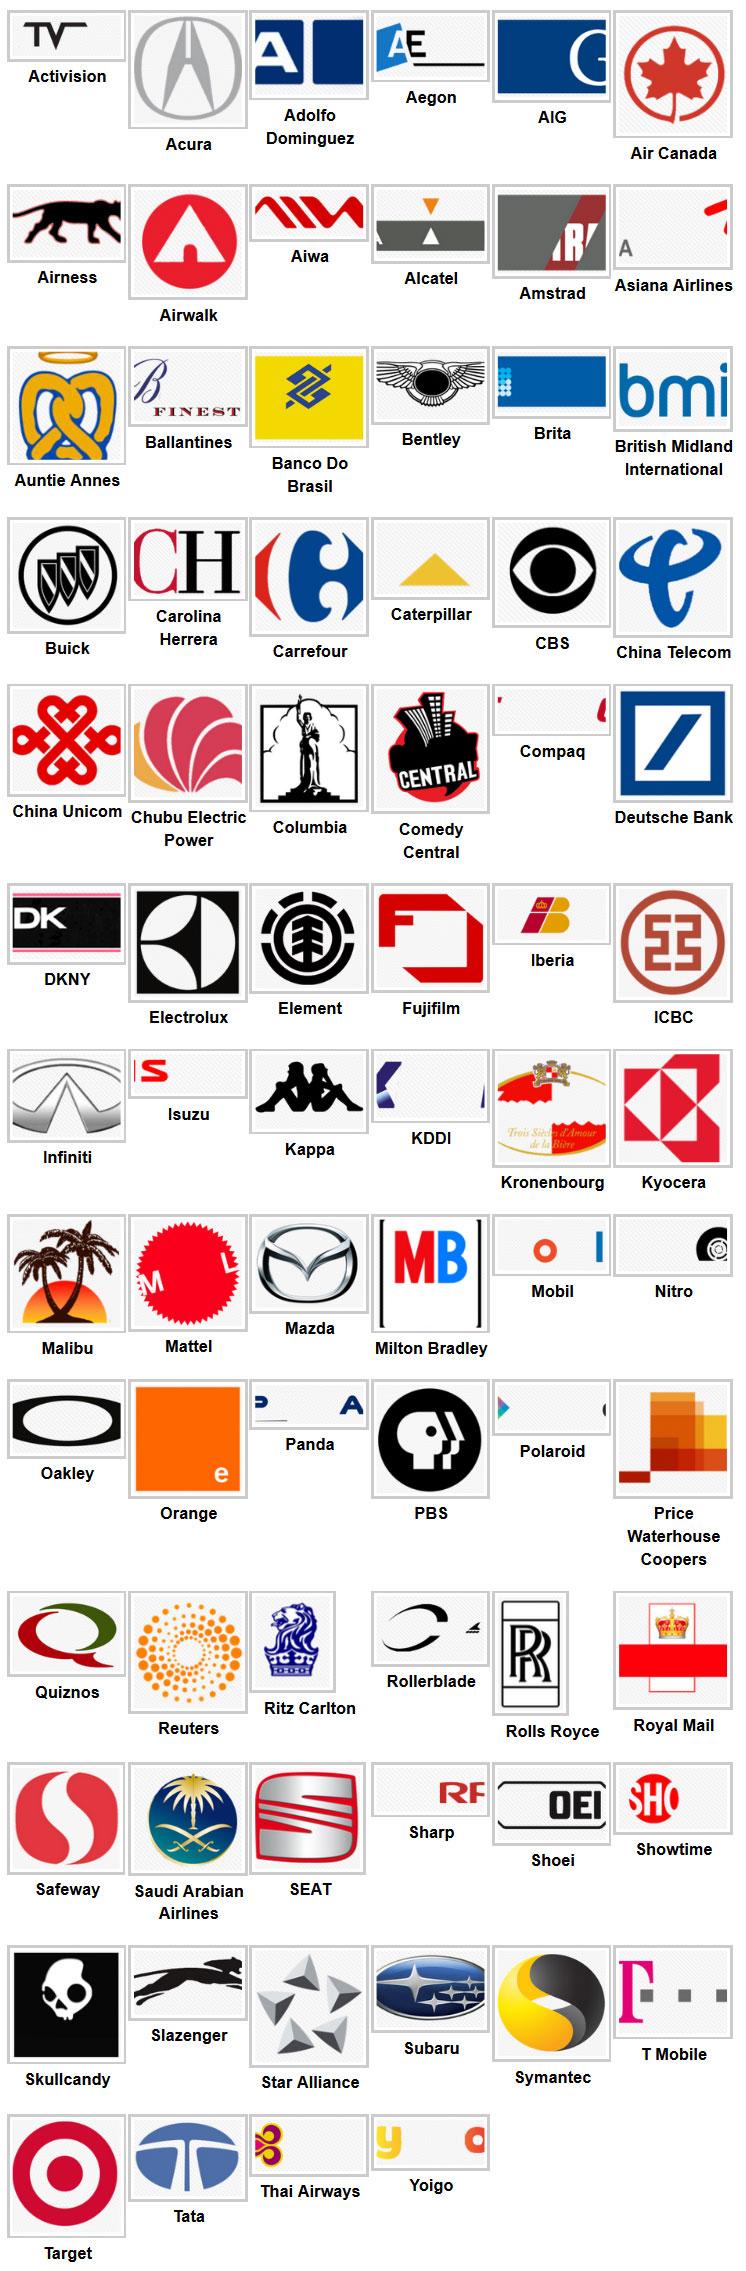 Logo quiz7 Logo quiz, Logo quiz answers, Quiz